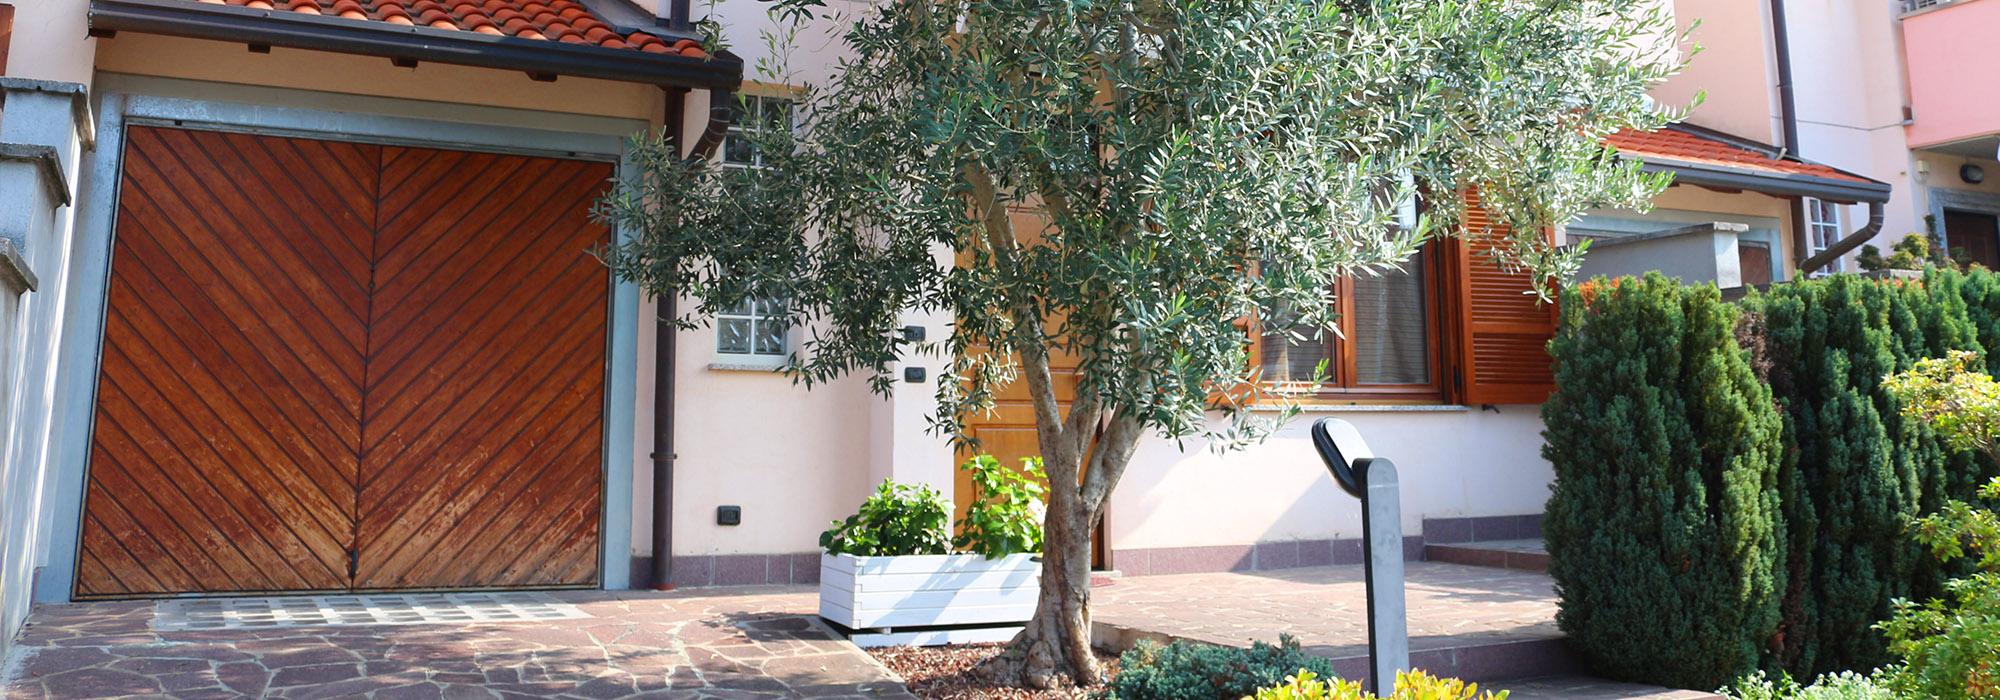 Villetta a schiera in vendita, Dairago